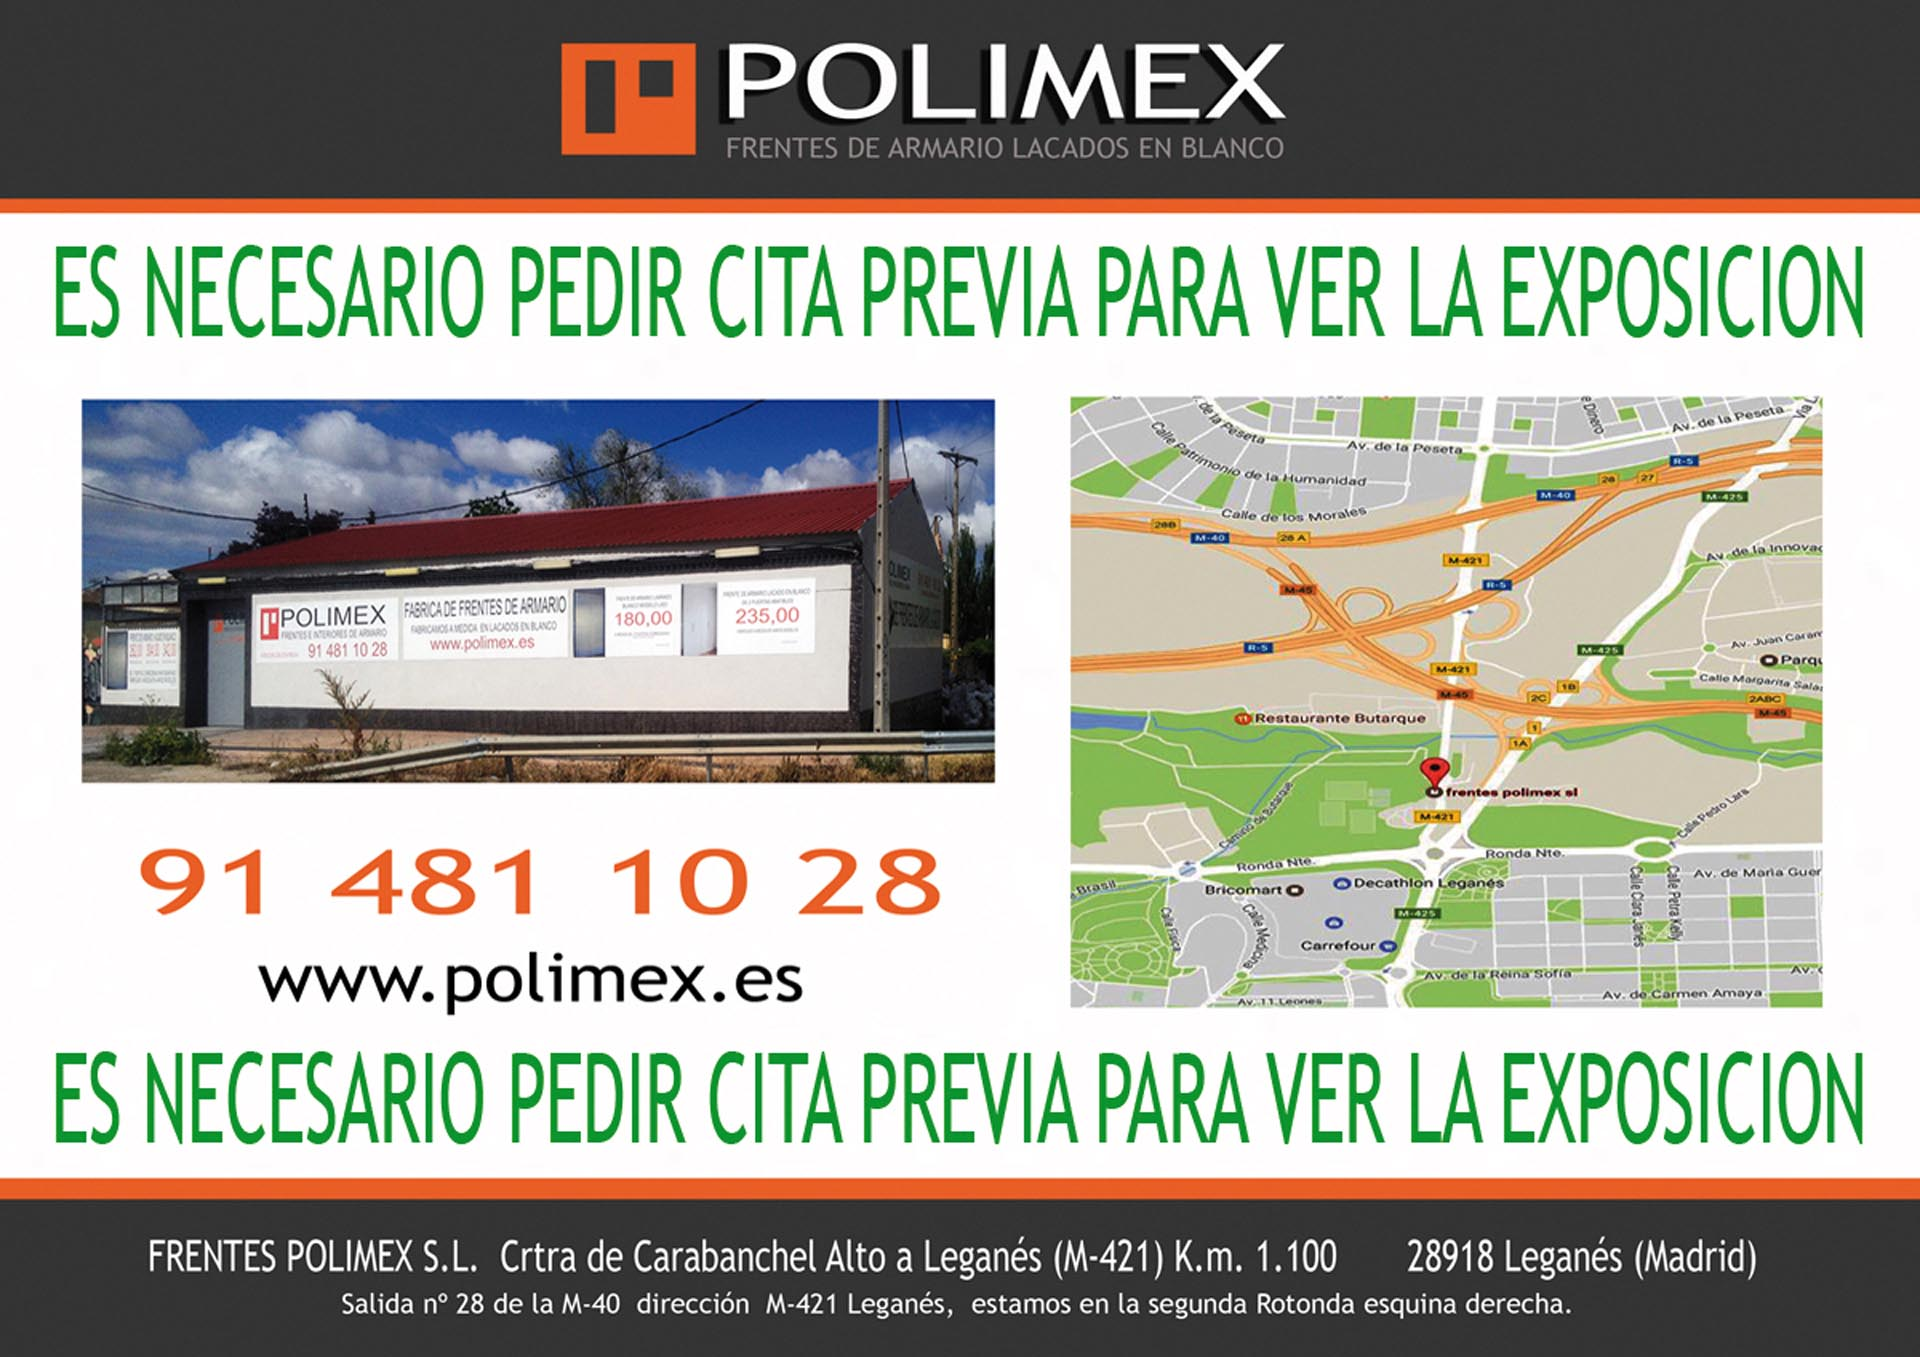 Contacto frentes polimex